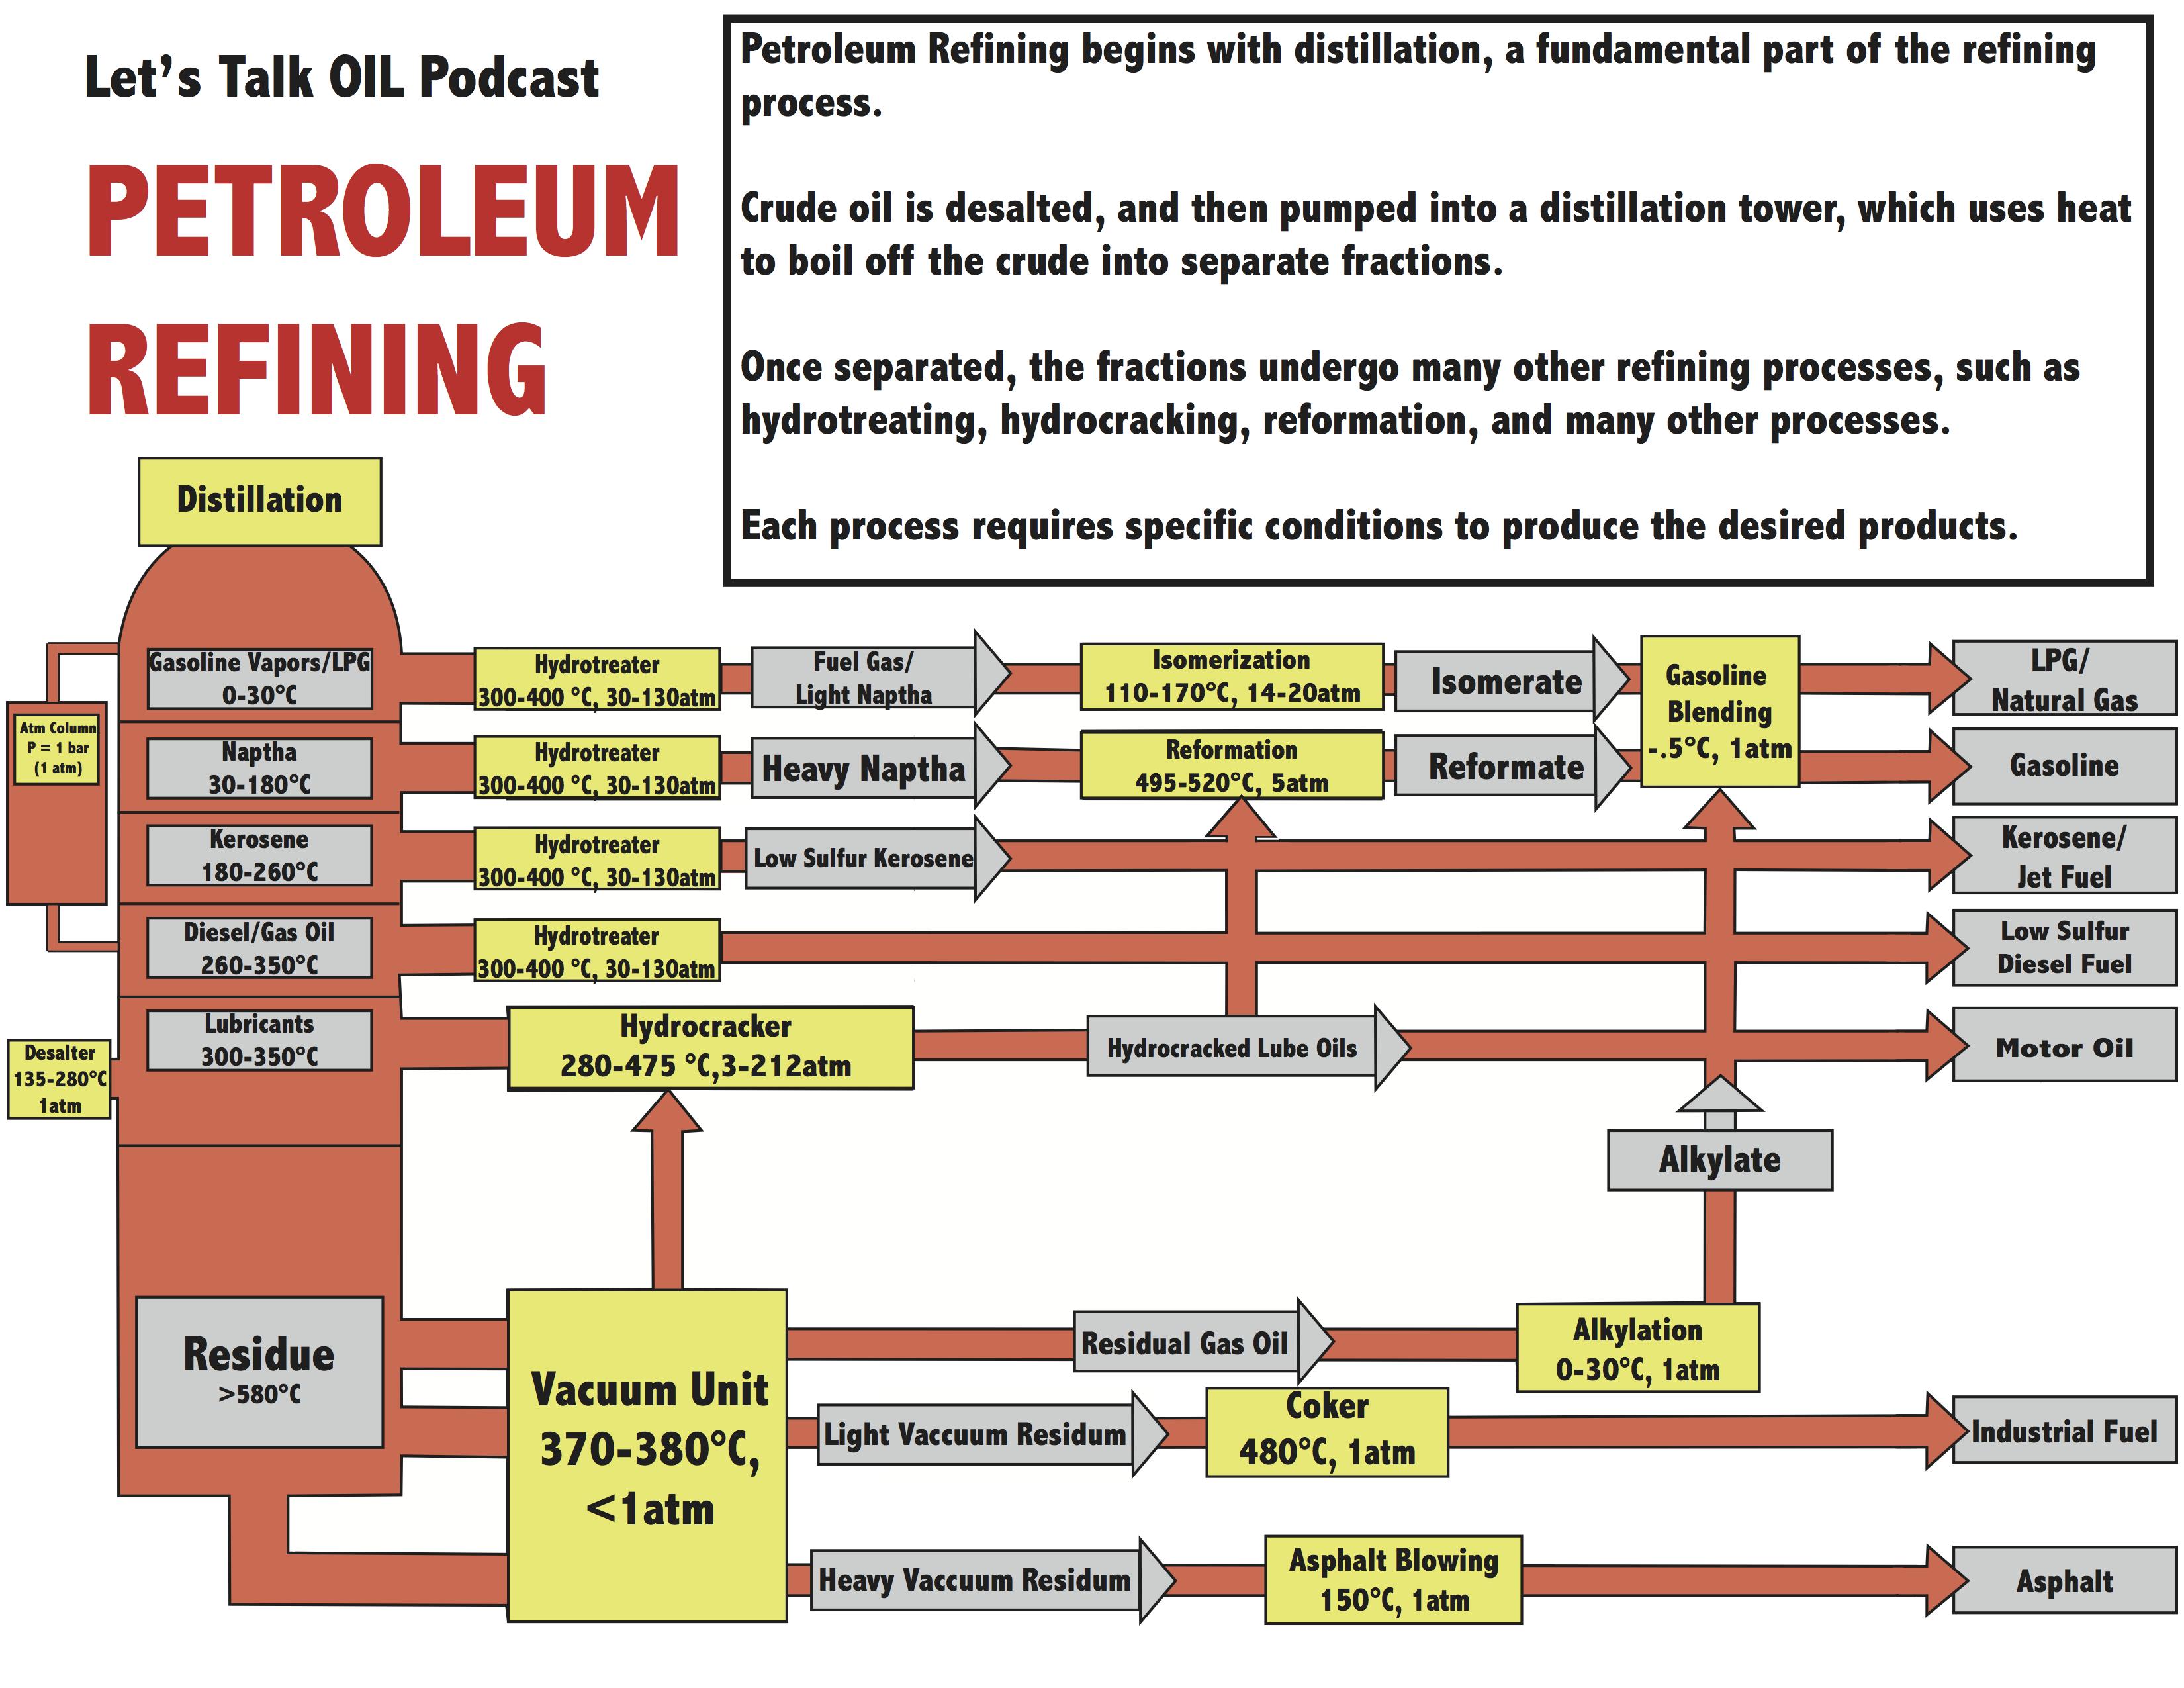 petroleum refining   رسانه ی خبری وبلاگیpetroleum refining